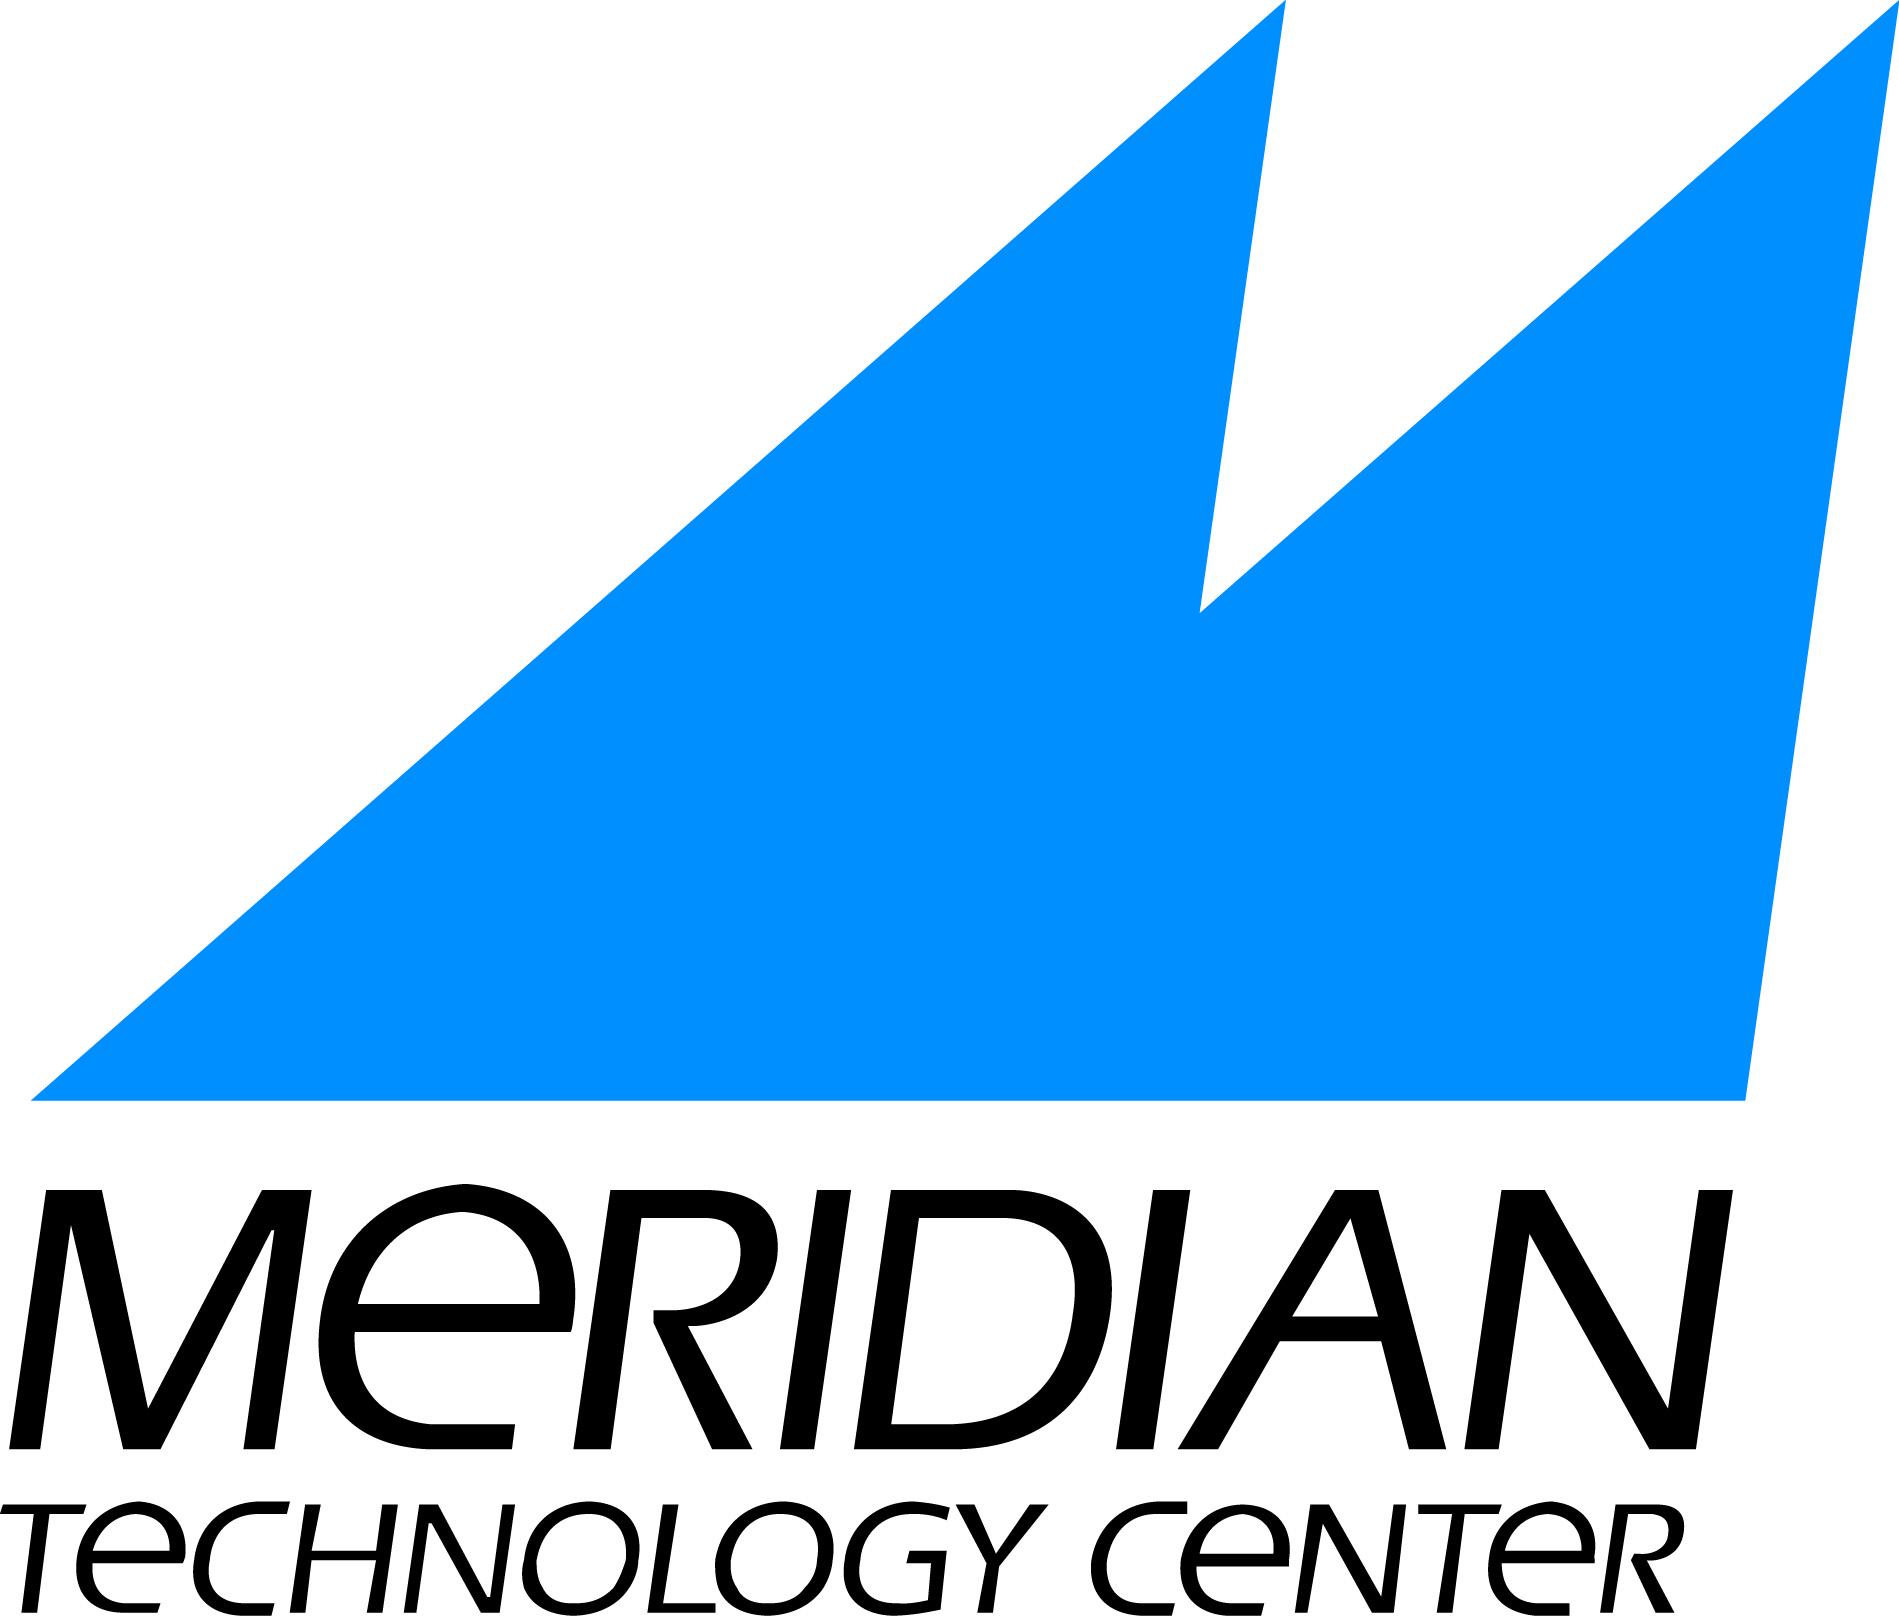 Meridian Technology Center for Business Development